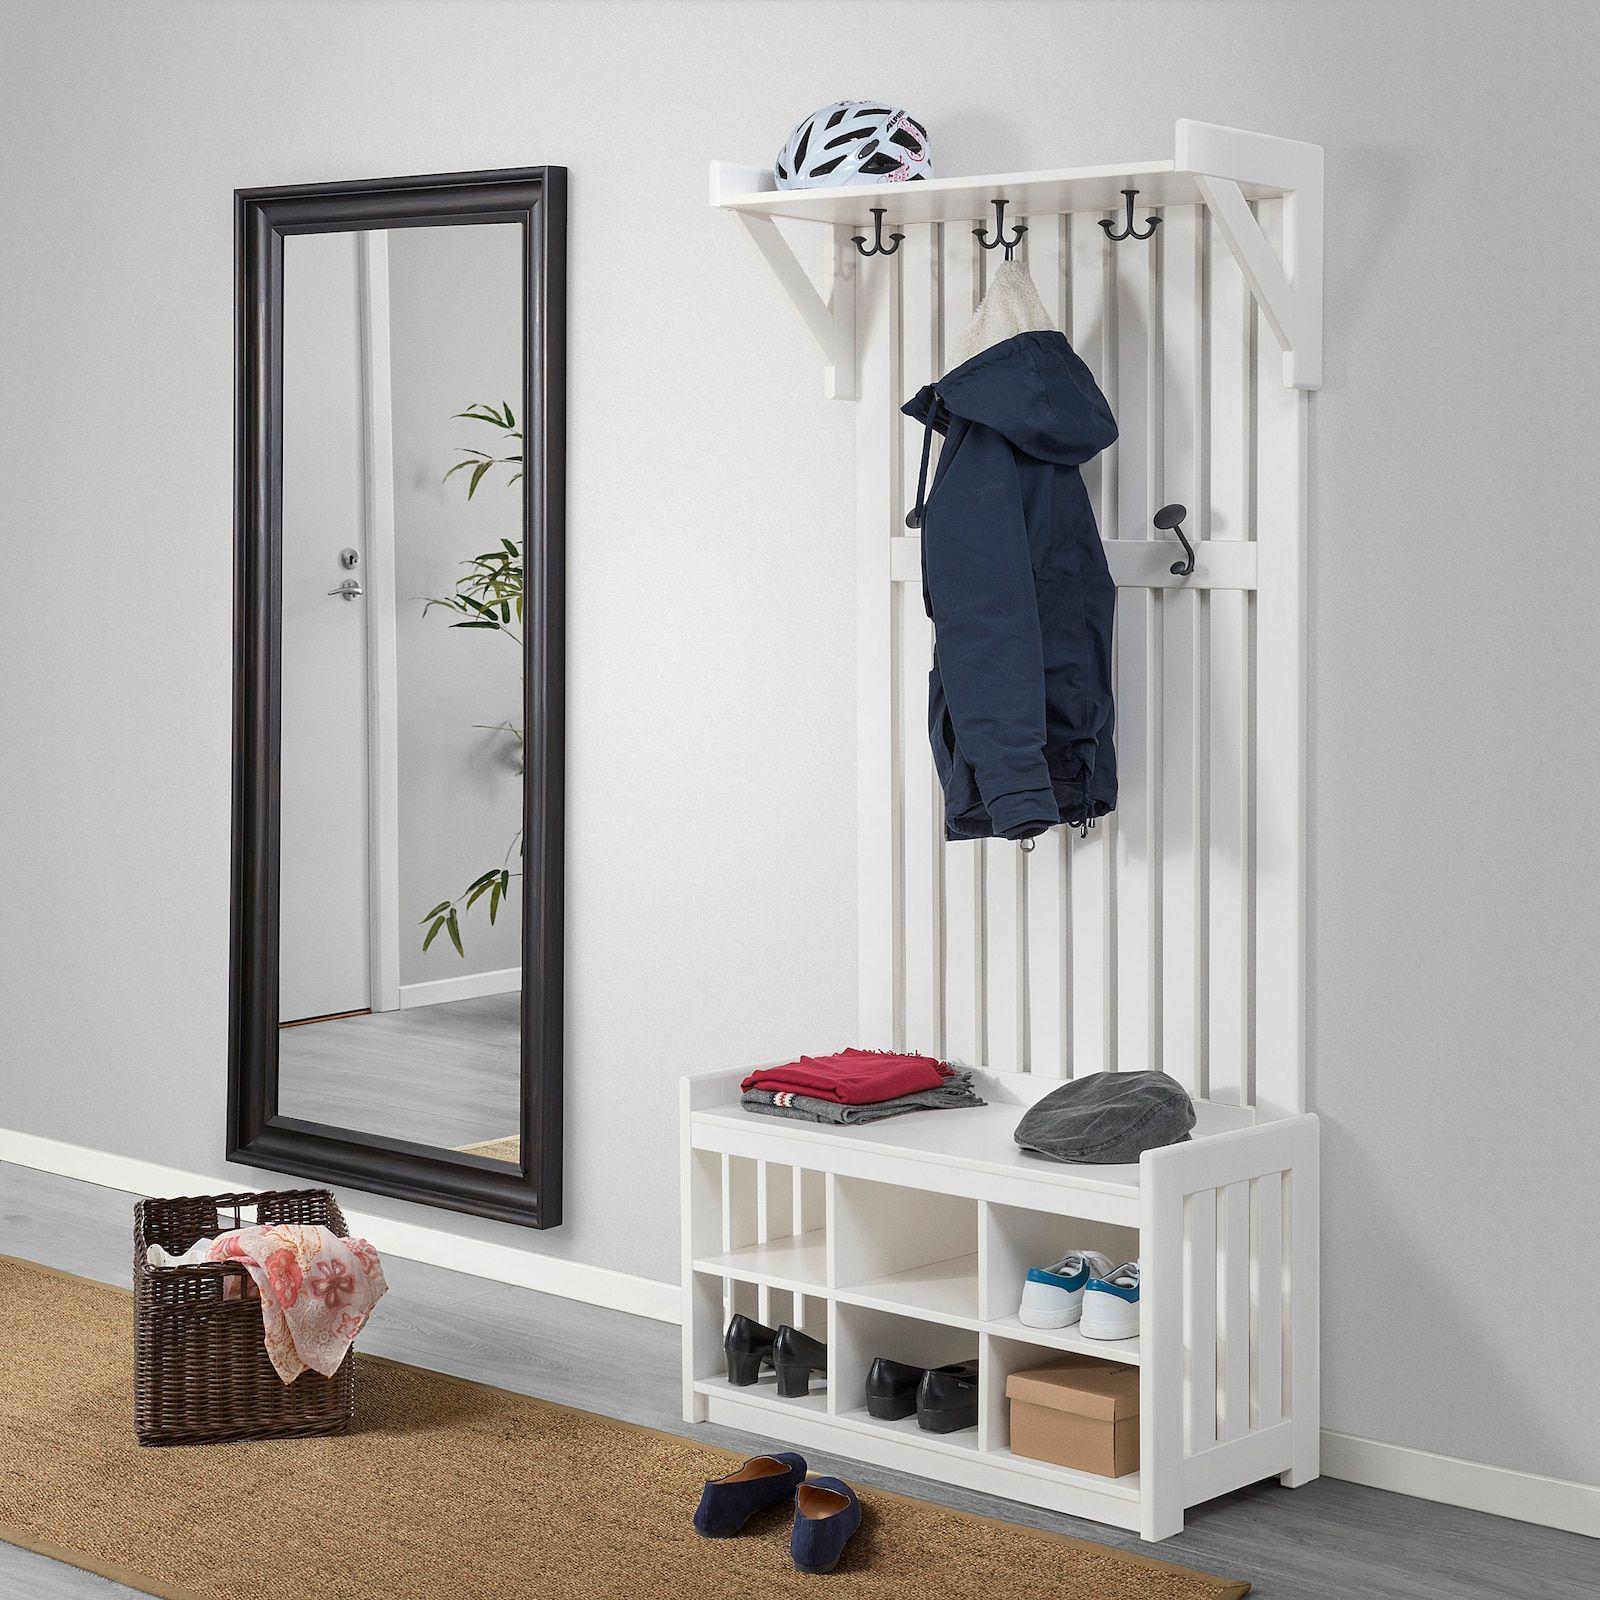 panget coat rack with shoe storage